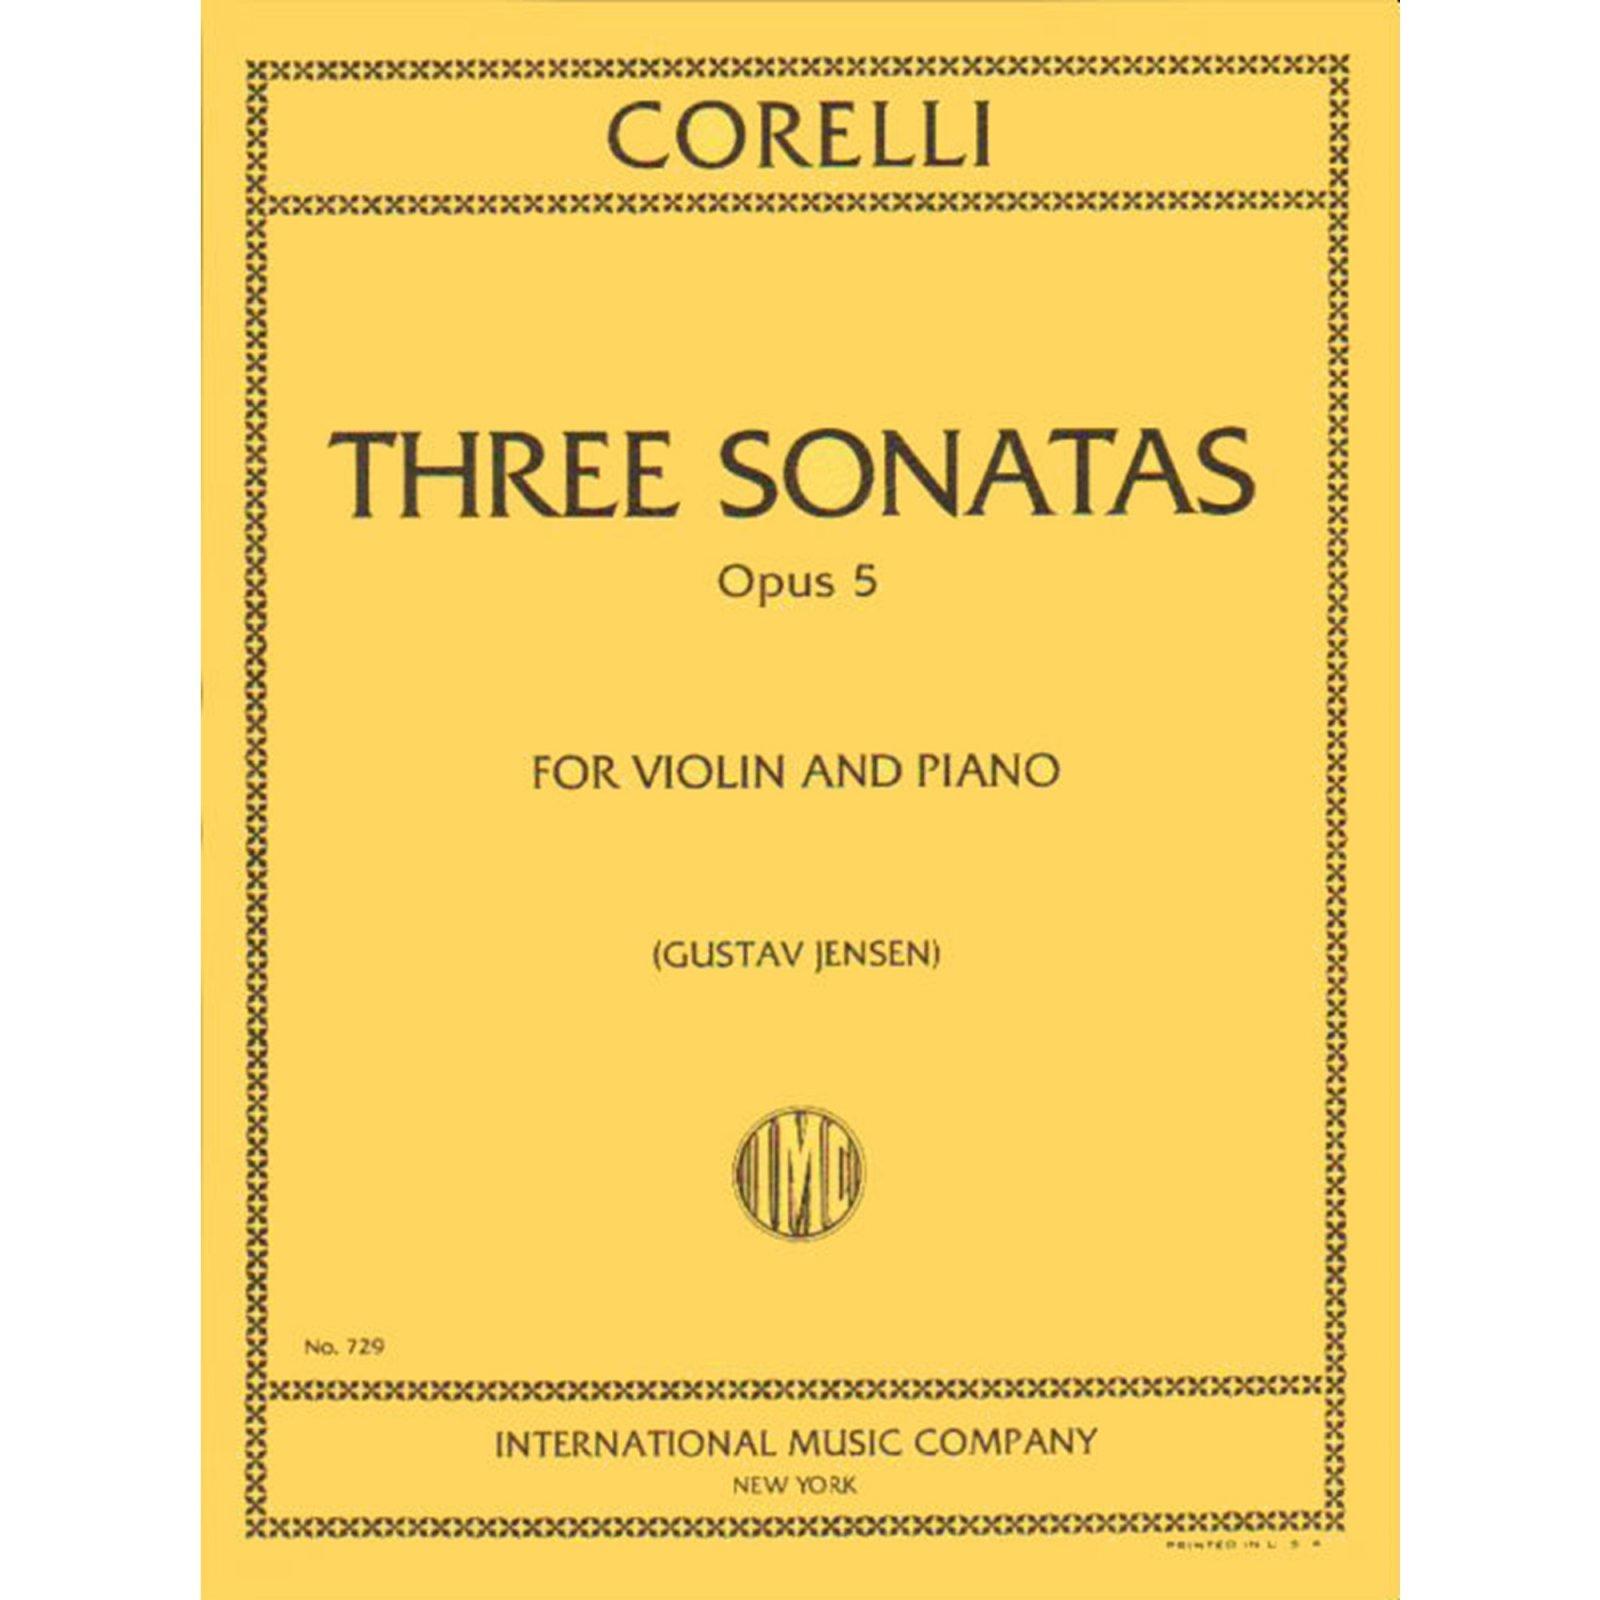 Corelli: 3 Selected Sonatas From Op. 5 Ed. Jensen